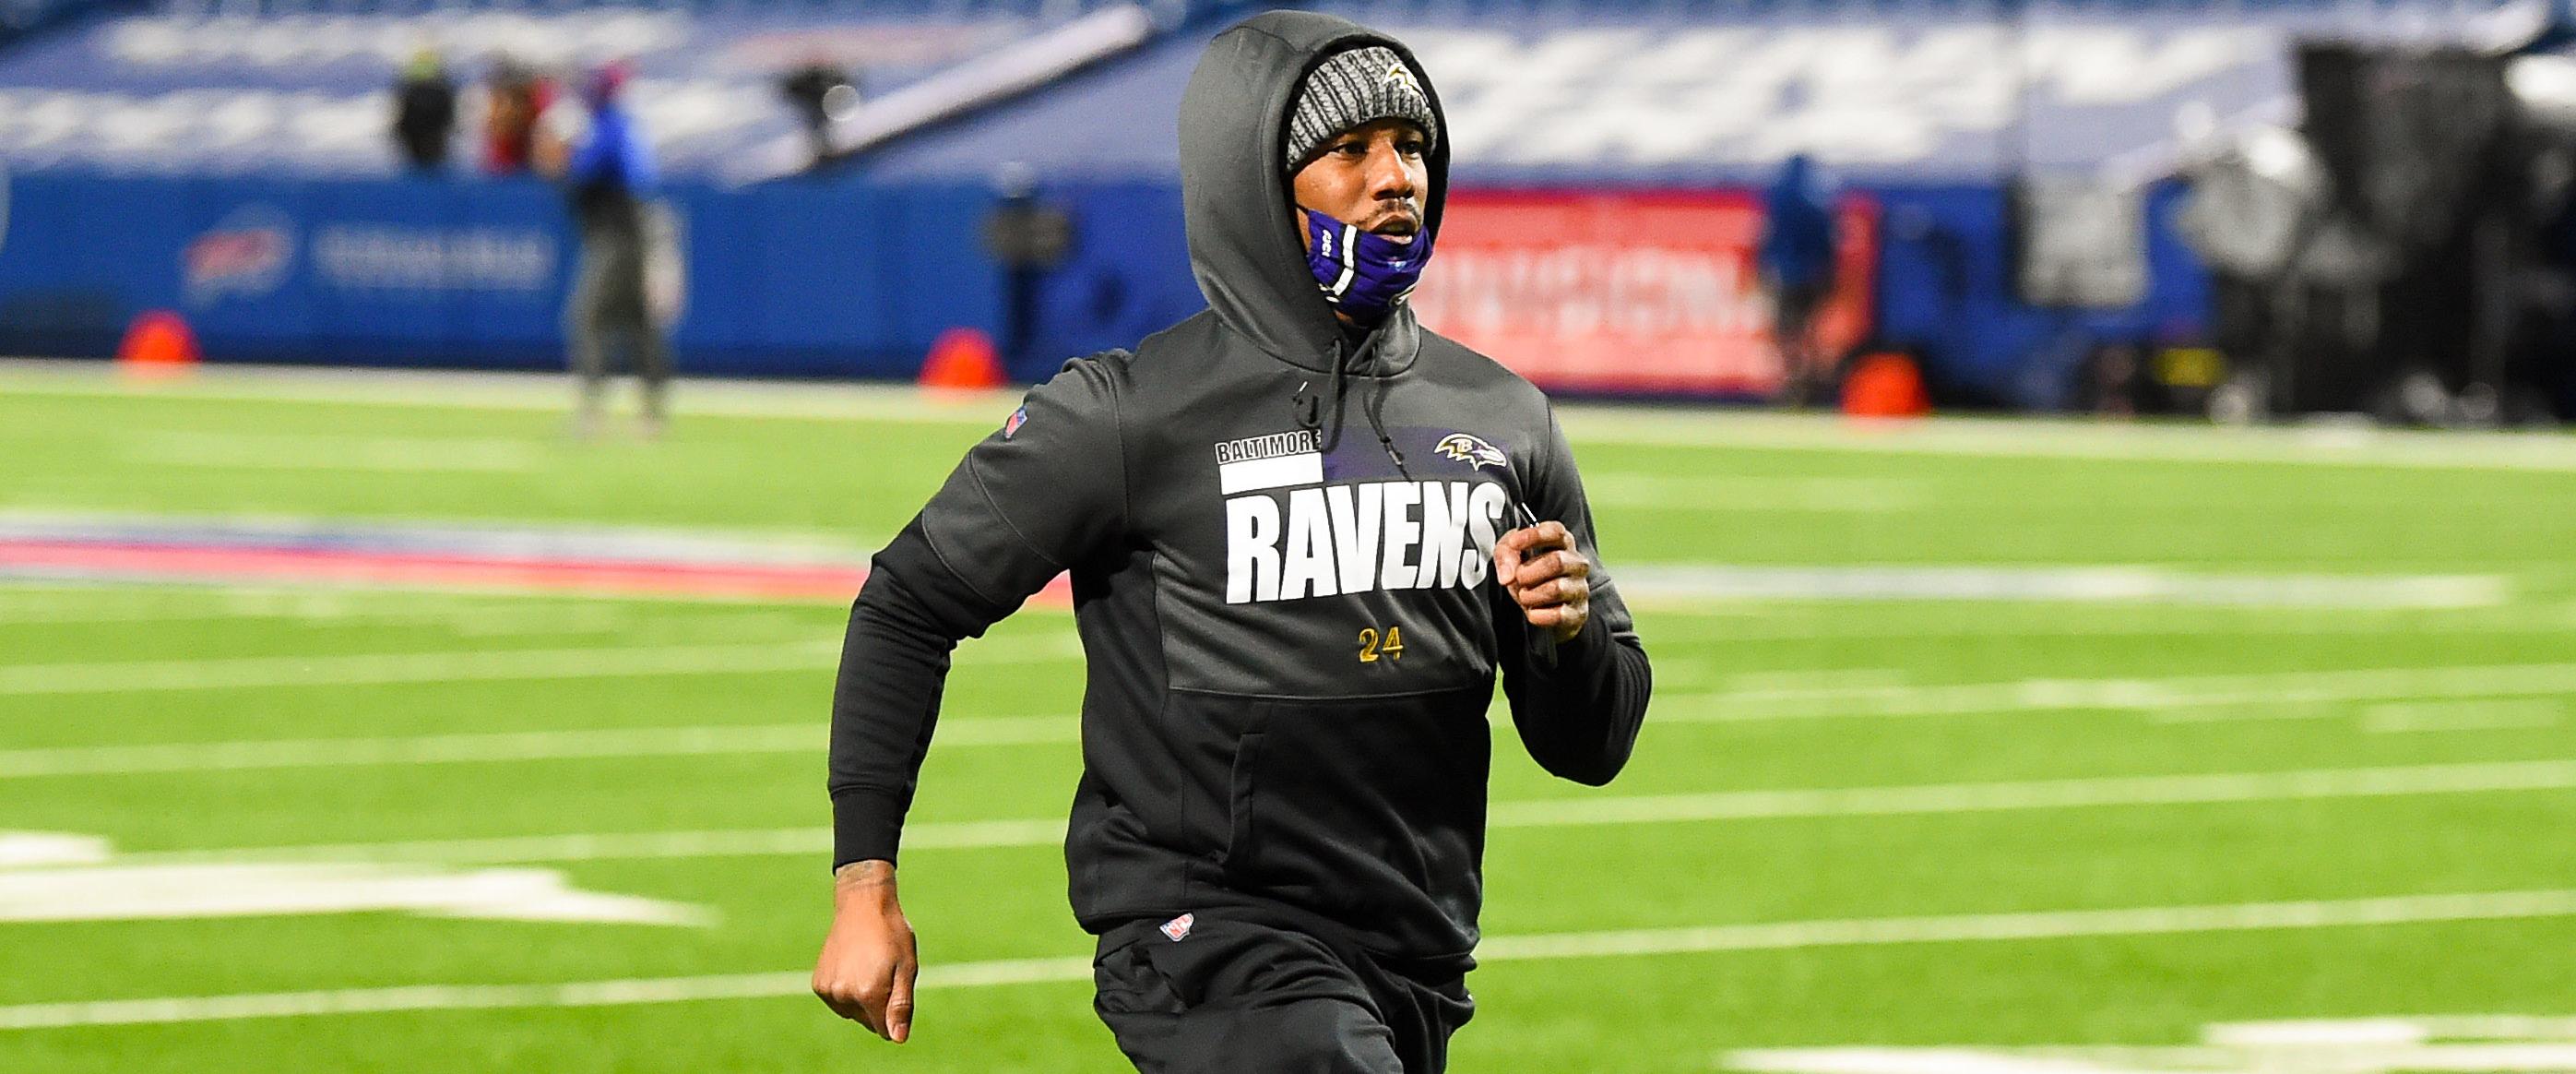 The Baltimore Ravens have an injury crisis